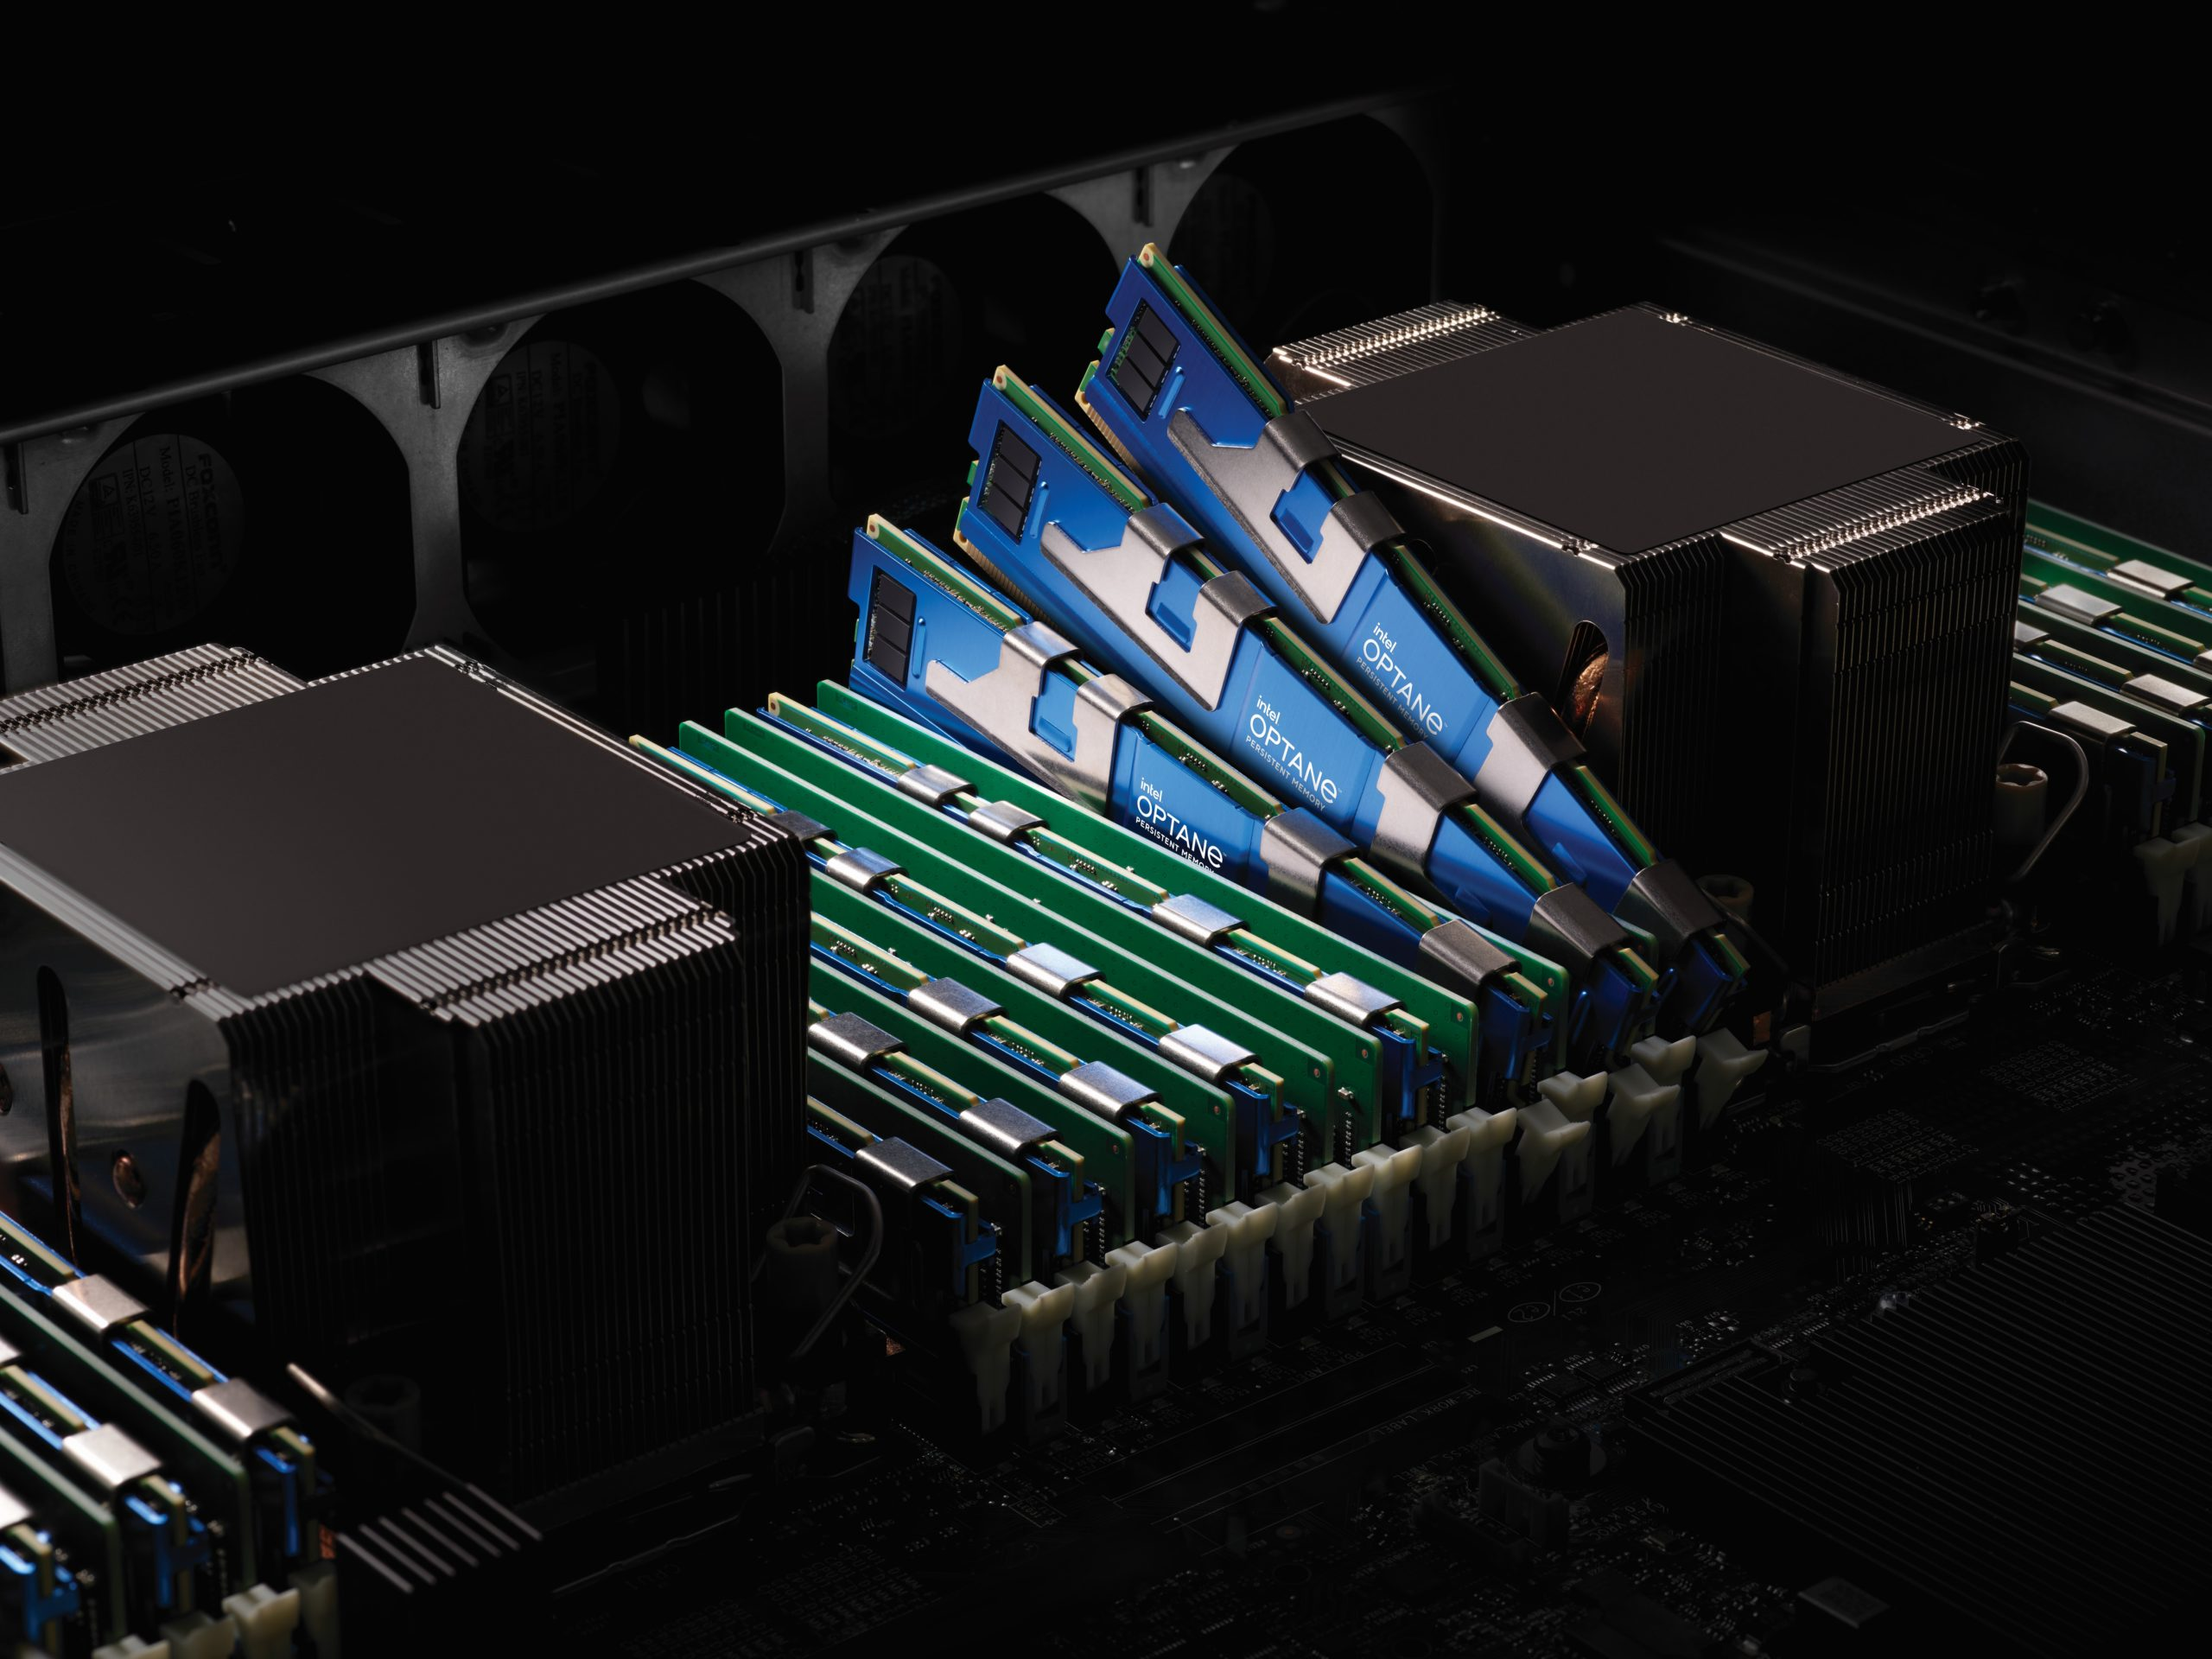 Intel-Optane-PMem-200-series-motherboard